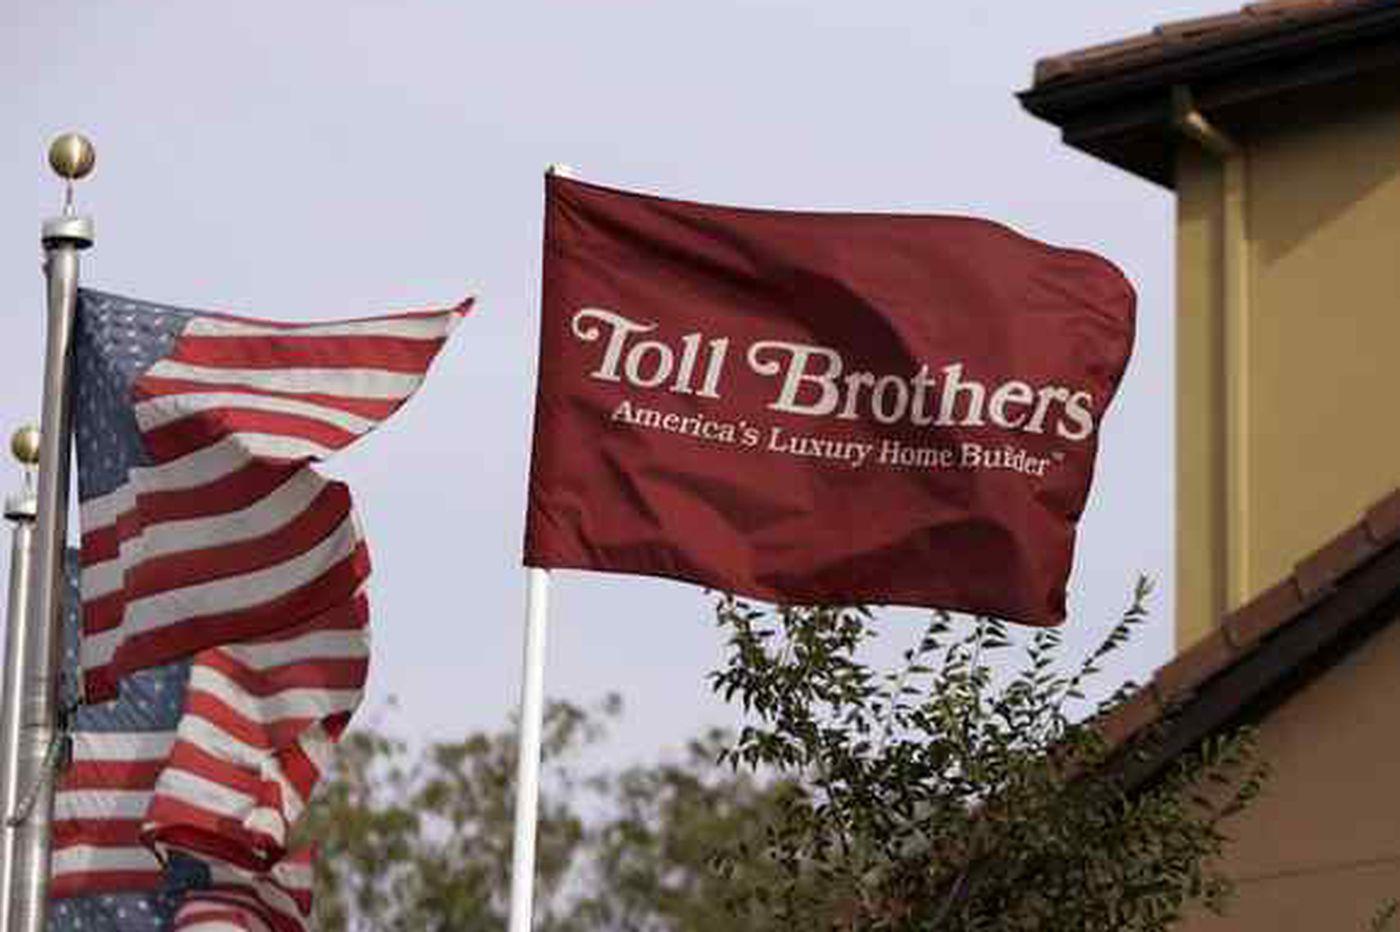 Toll Bros.' woes show mounting U.S. slowdown fears